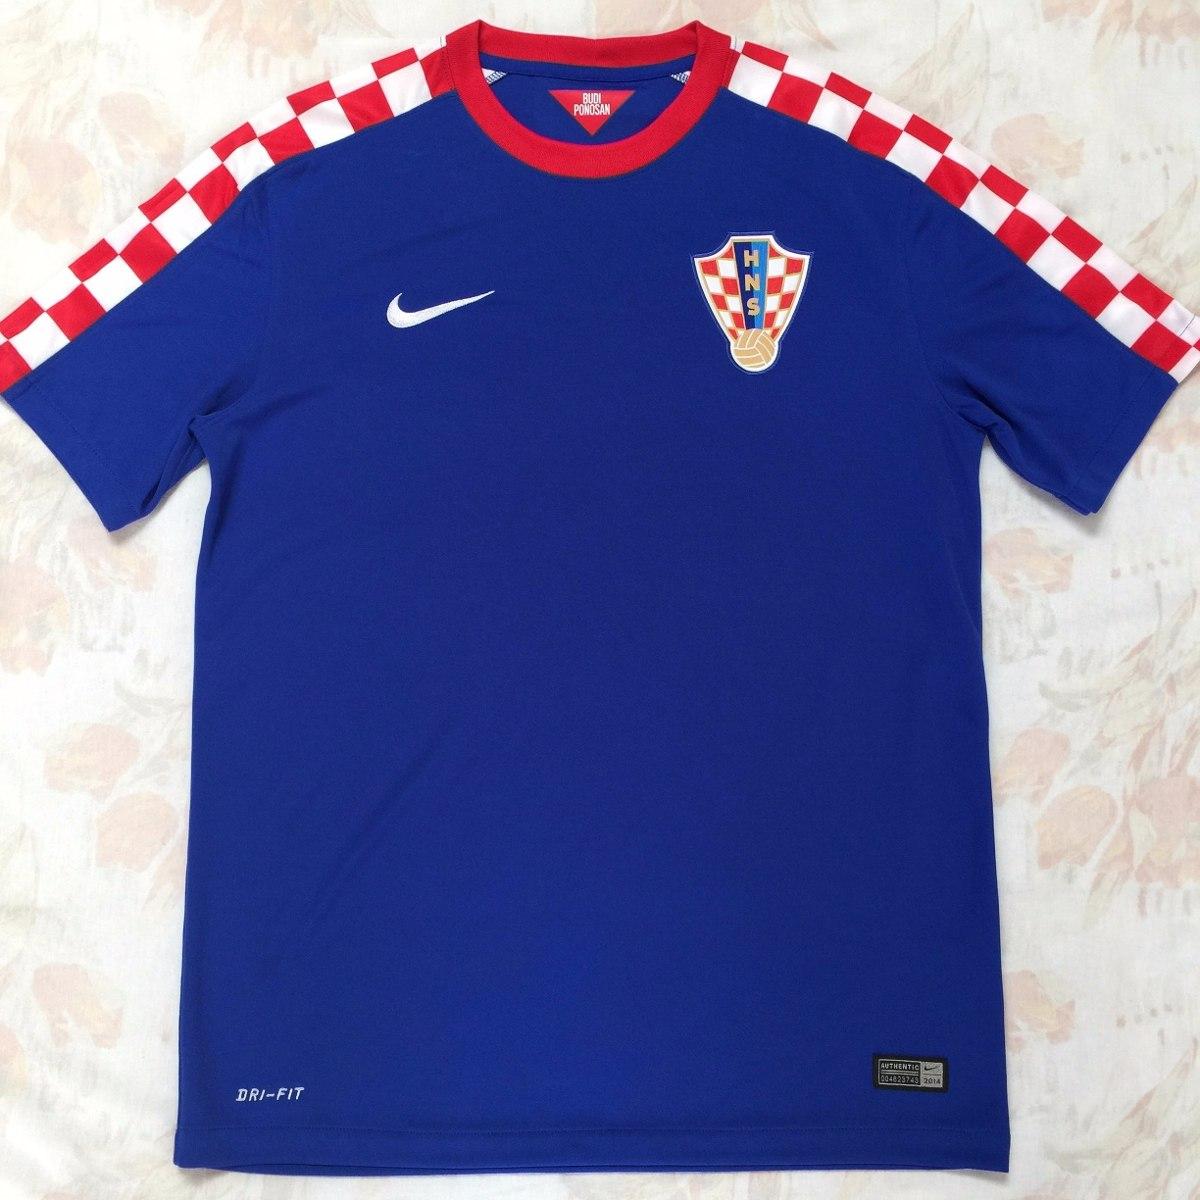 cb679196f 610808-471 Camisa Nike Croácia Away 2014 M Azul Fn1608 - R  1.499